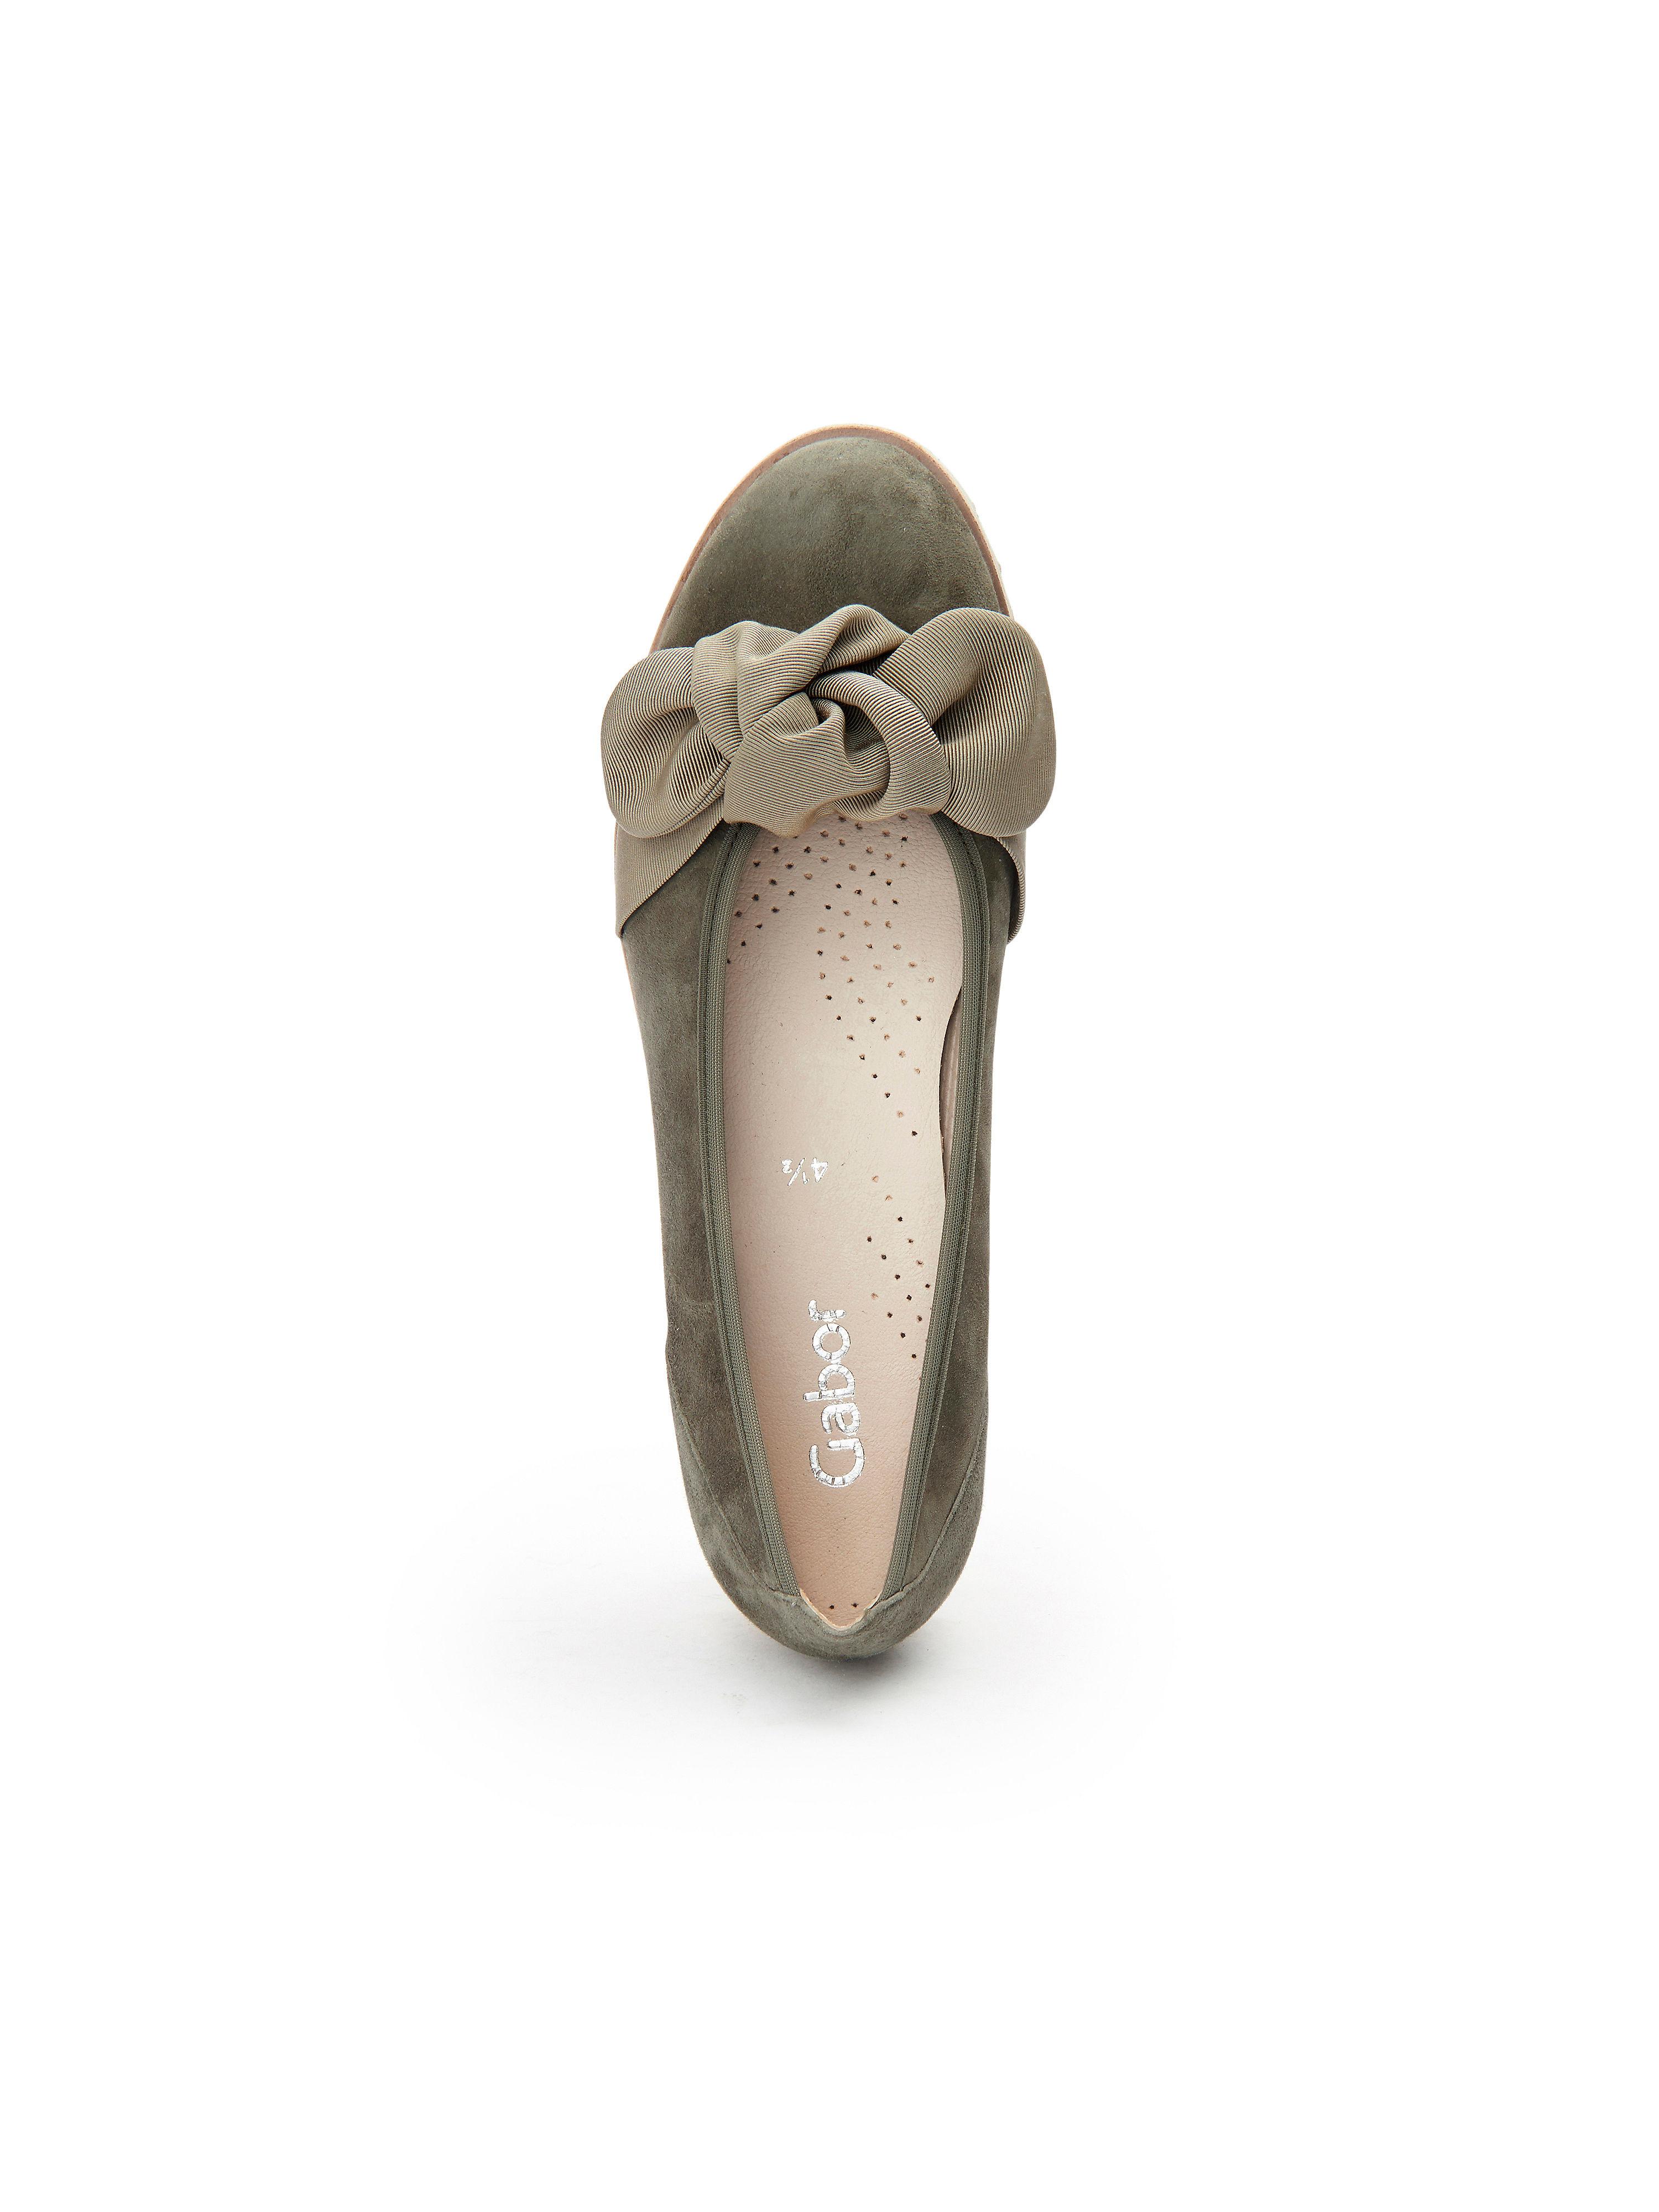 Gabor - Ballerina - beliebte Olivgrün Gute Qualität beliebte - Schuhe 767e35